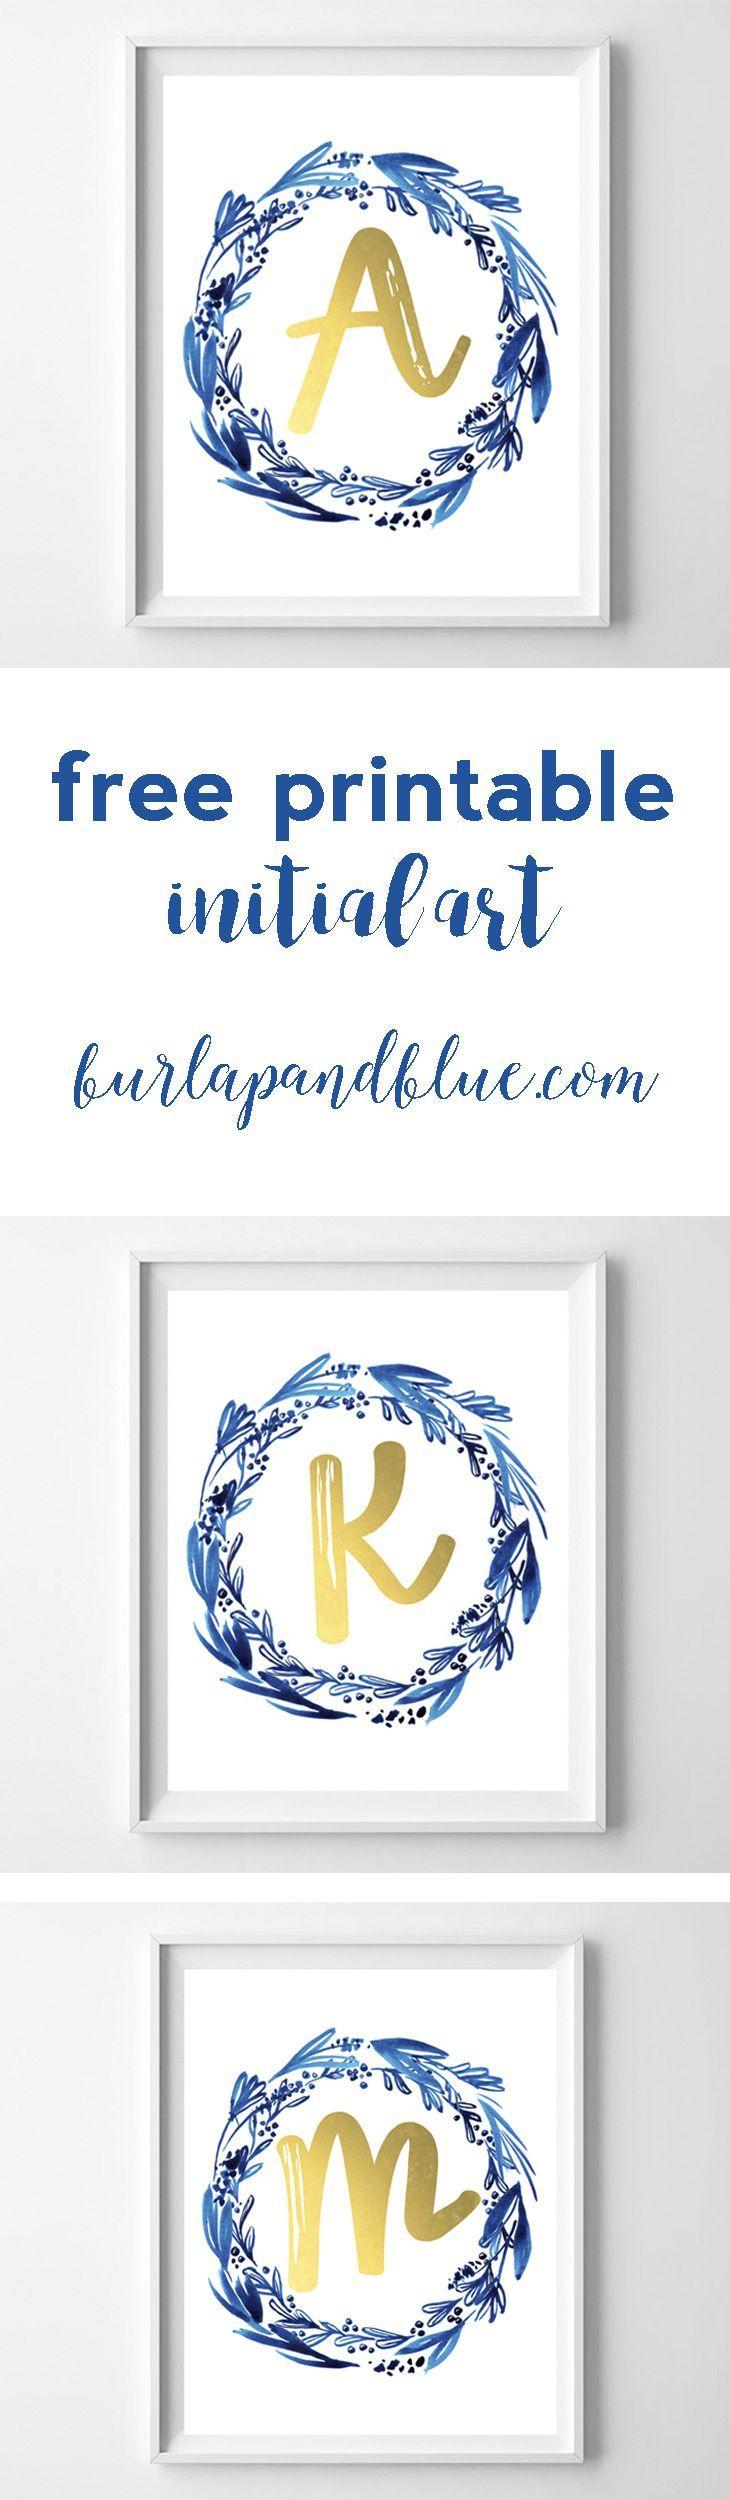 Printable Room Decor Best 25 Blue Room Decor Ideas On Pinterest Small Office Spaces